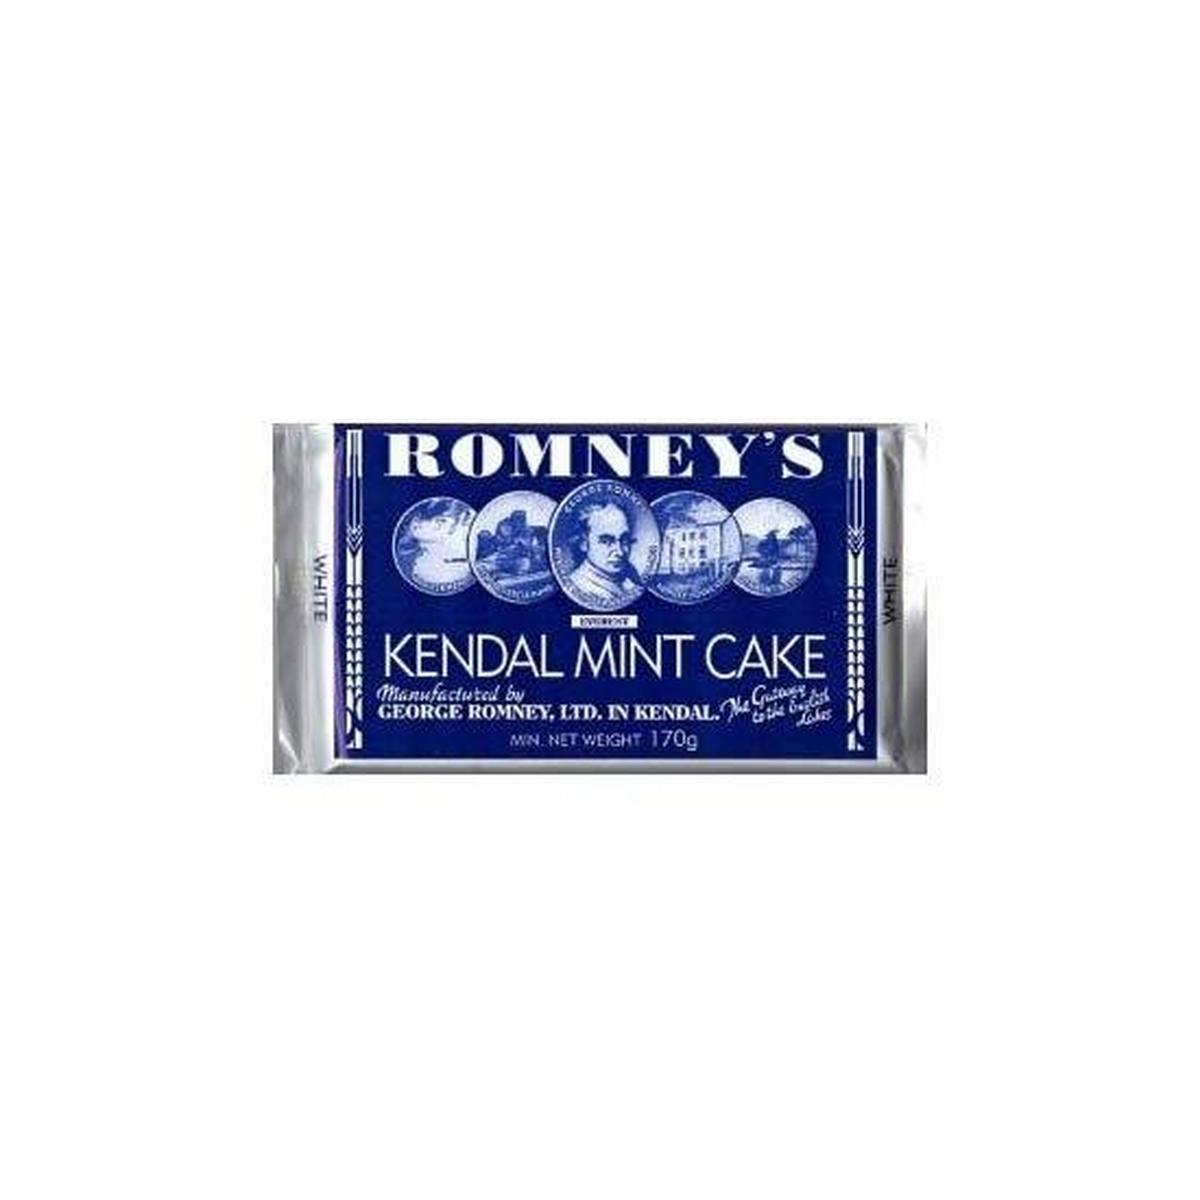 Romneys Kendal Mink Cake 170g Bar